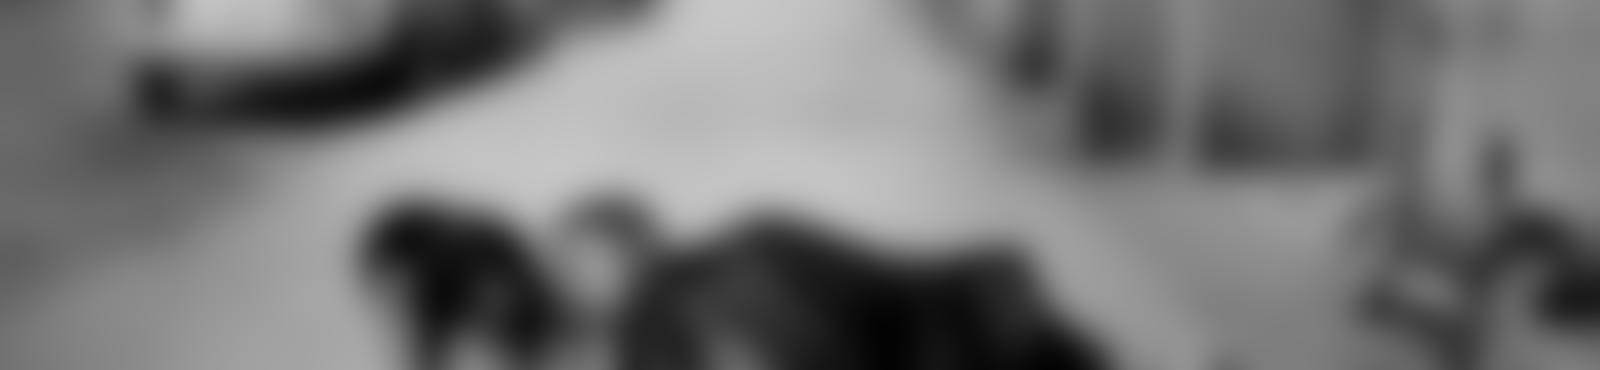 Blurred c35d267a b48e 43f5 875b 733d1582d67d